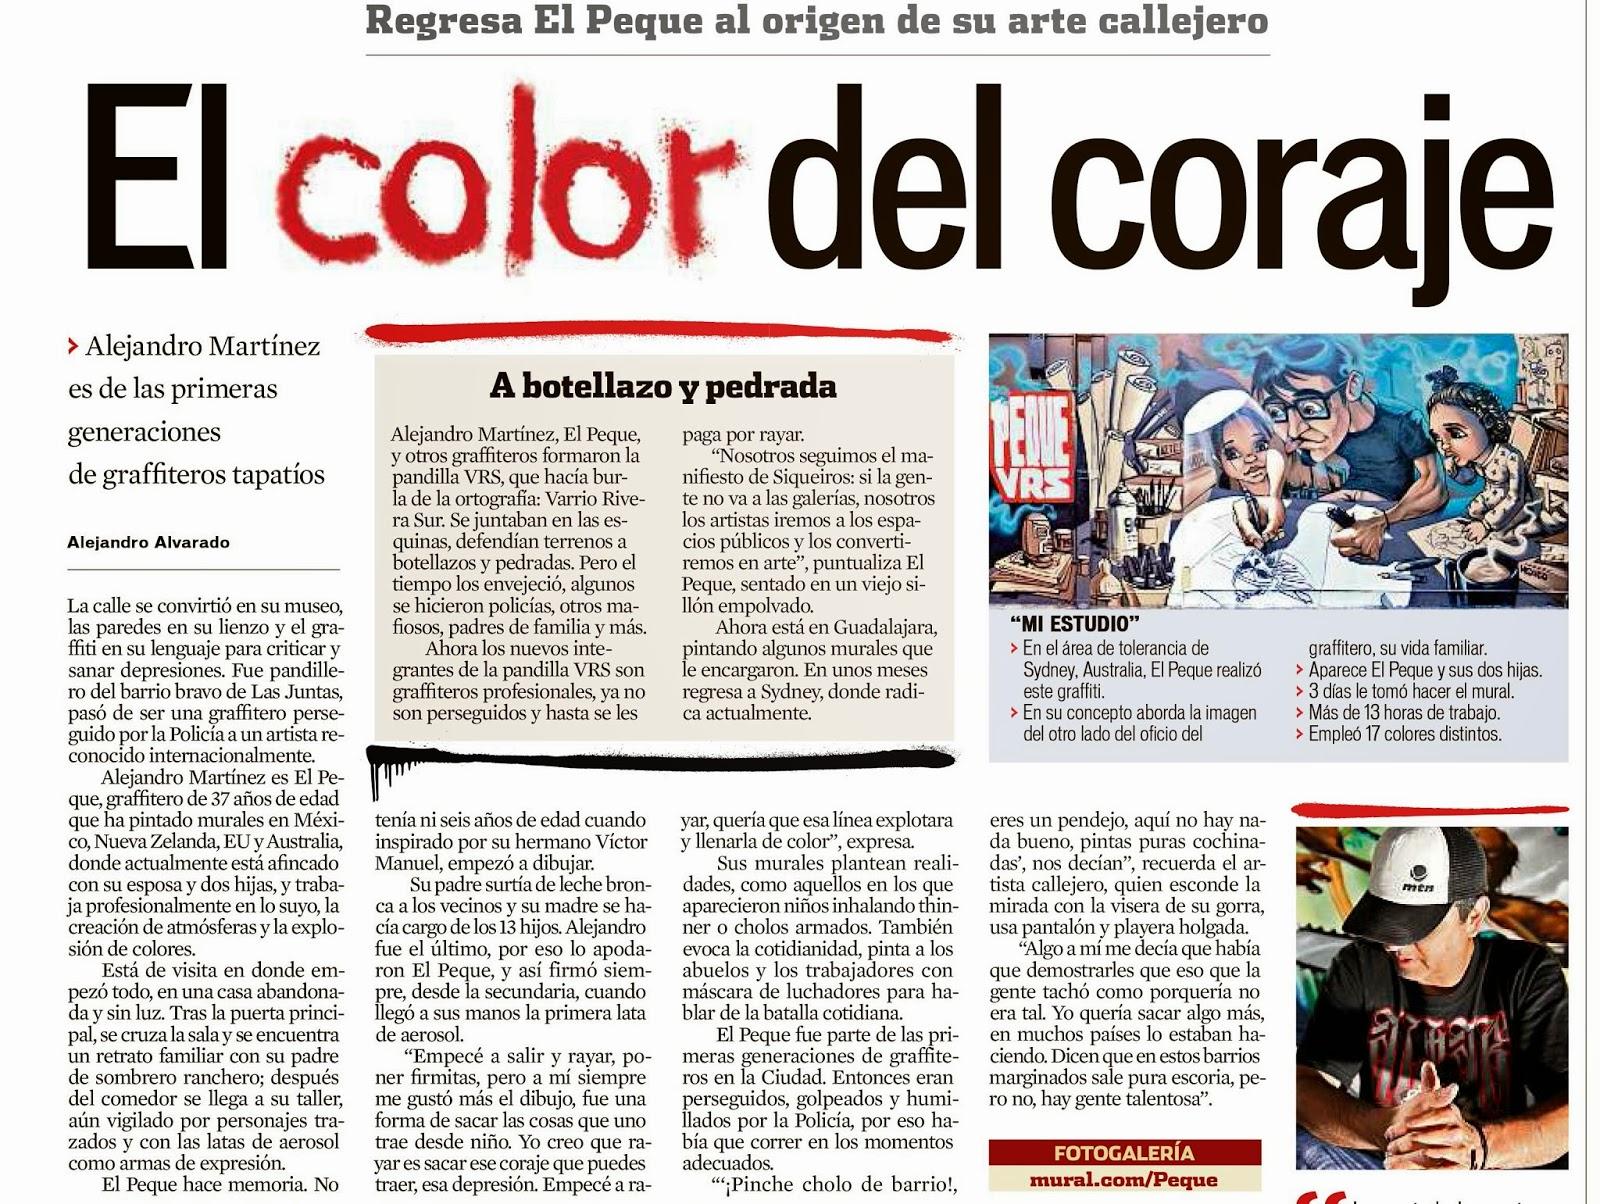 Imagenes de cultura periodico mural periodico mural de for Contenido del periodico mural